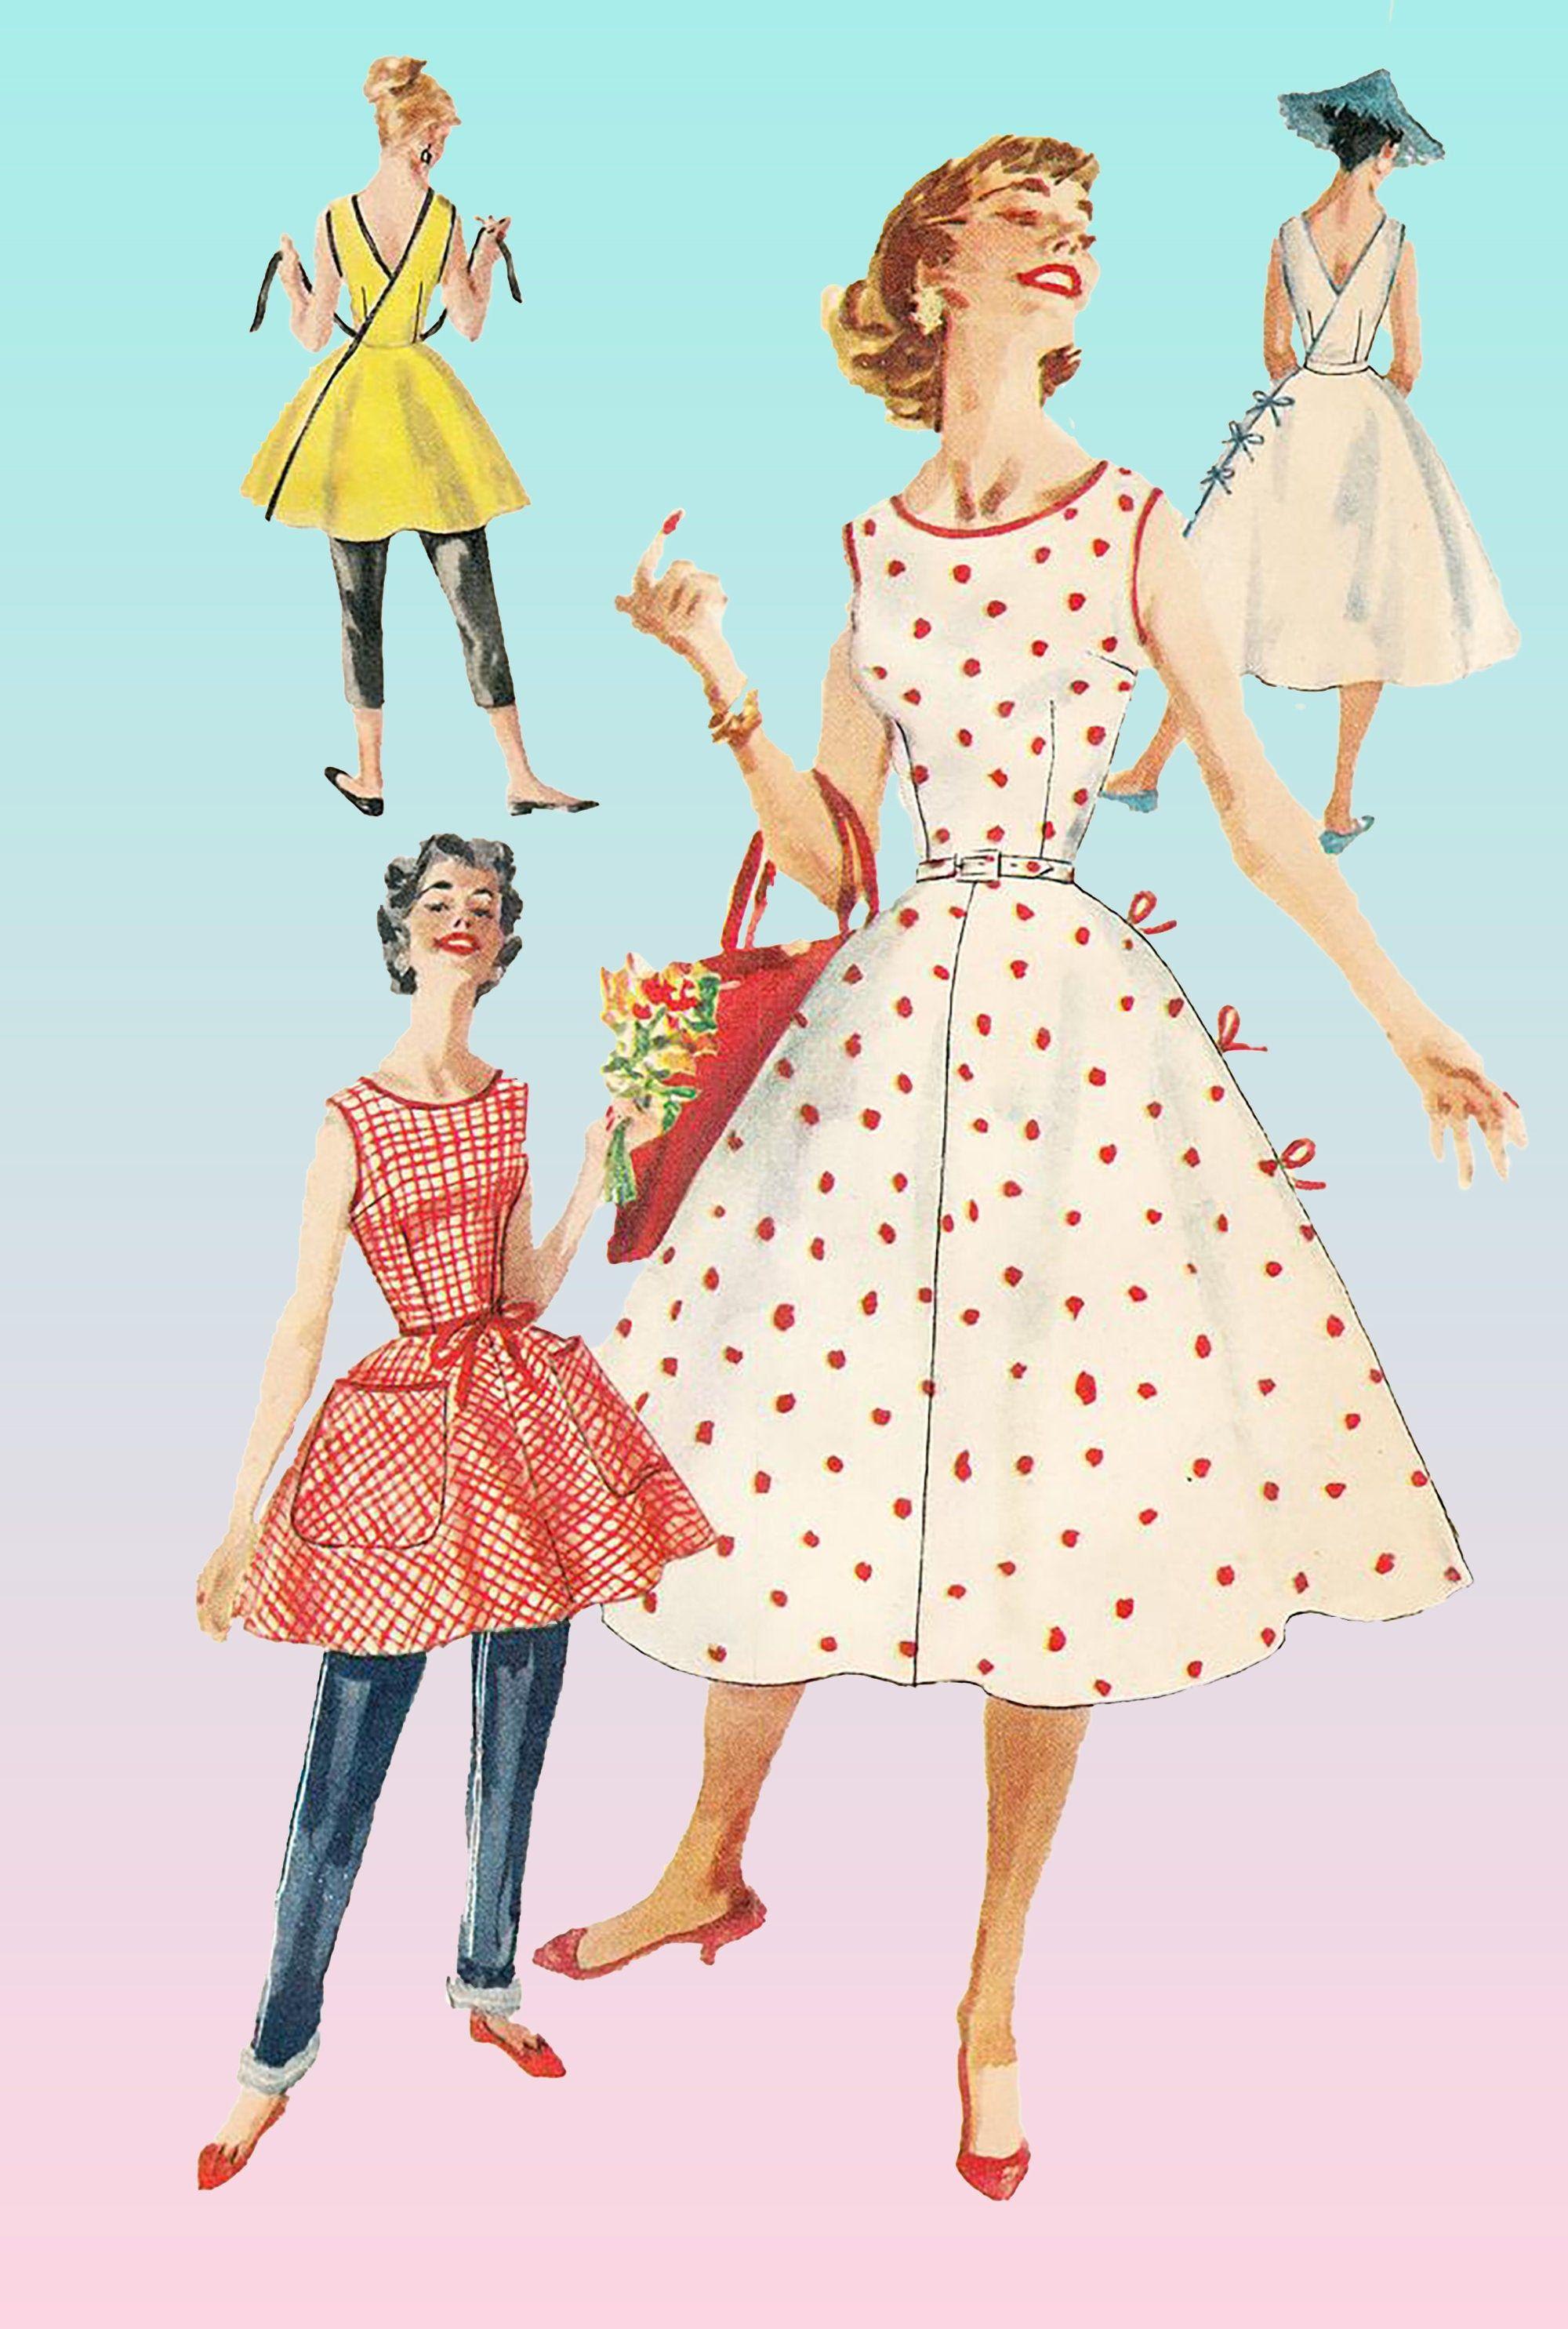 1950s Dress Pattern Simplicity 1662 50s Summer Dress 1956 Catskills Dress Wrap Dress Vintage Sewing Patterns Uncut Bust 32 1950s Dress Patterns Simplicity Patterns Dresses Vintage Dress Patterns [ 2970 x 2000 Pixel ]